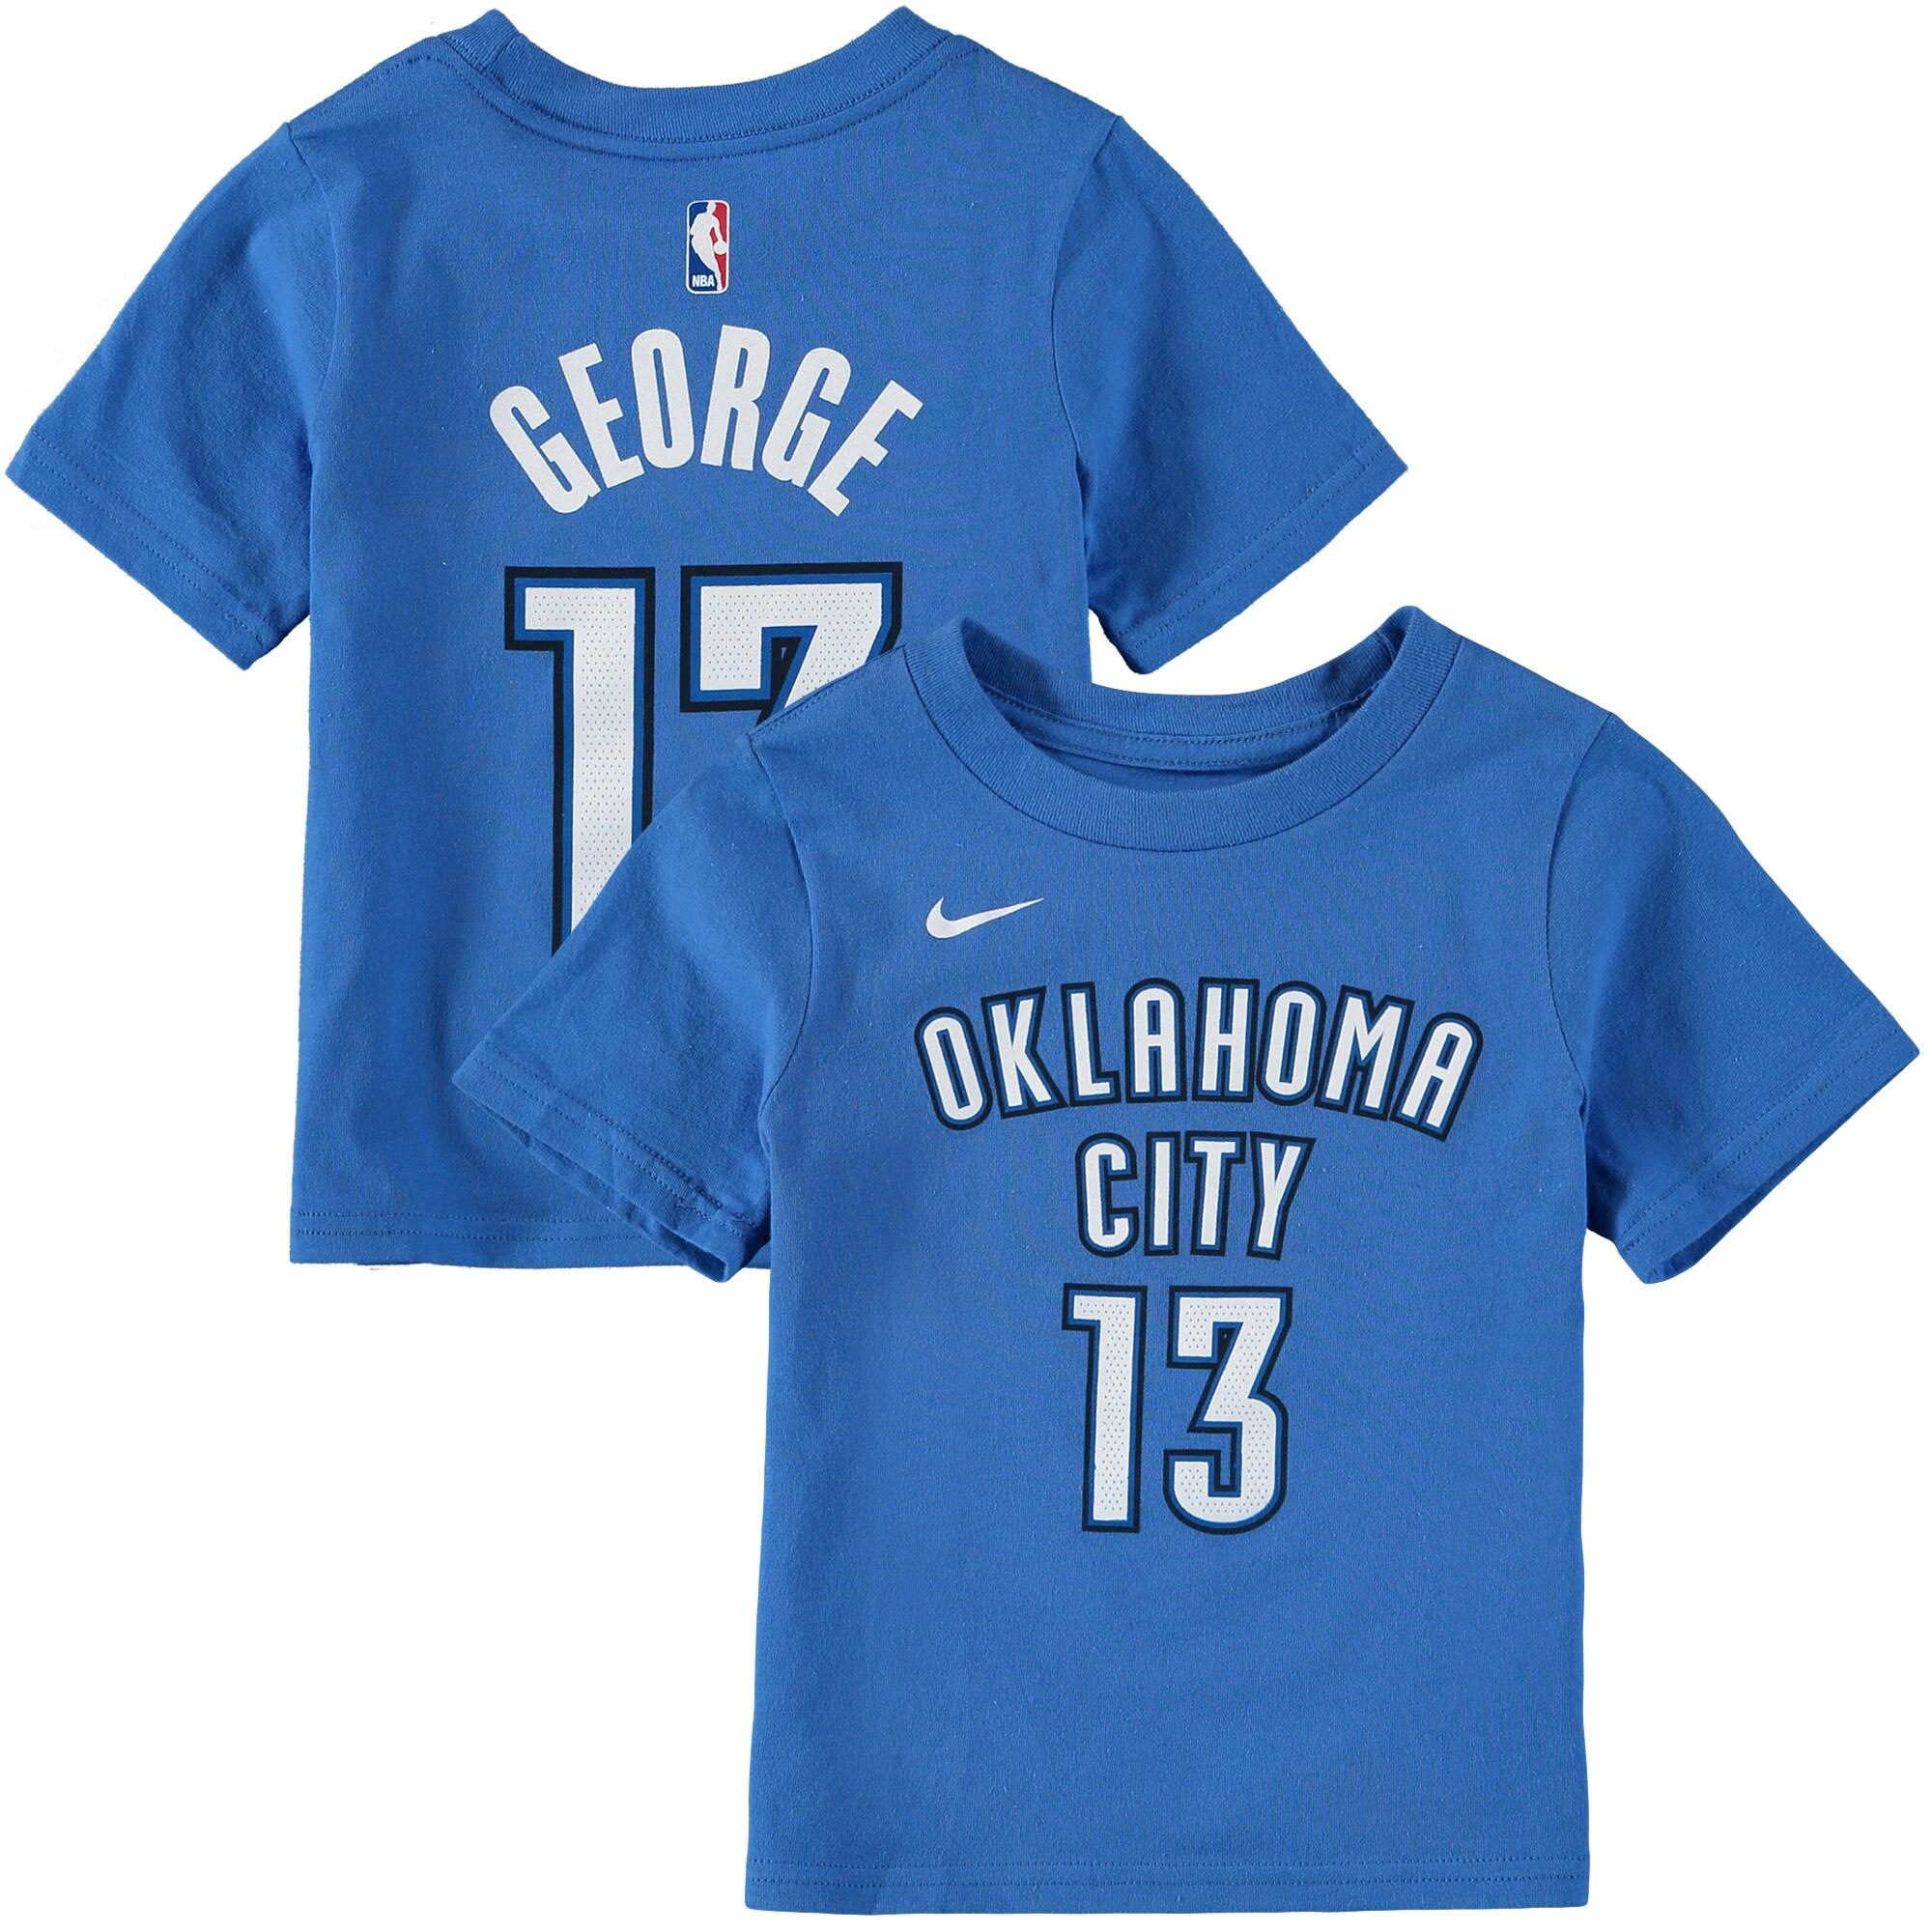 Paul George Oklahoma City Thunder Nike Toddler Name & Number T-Shirt - Blue